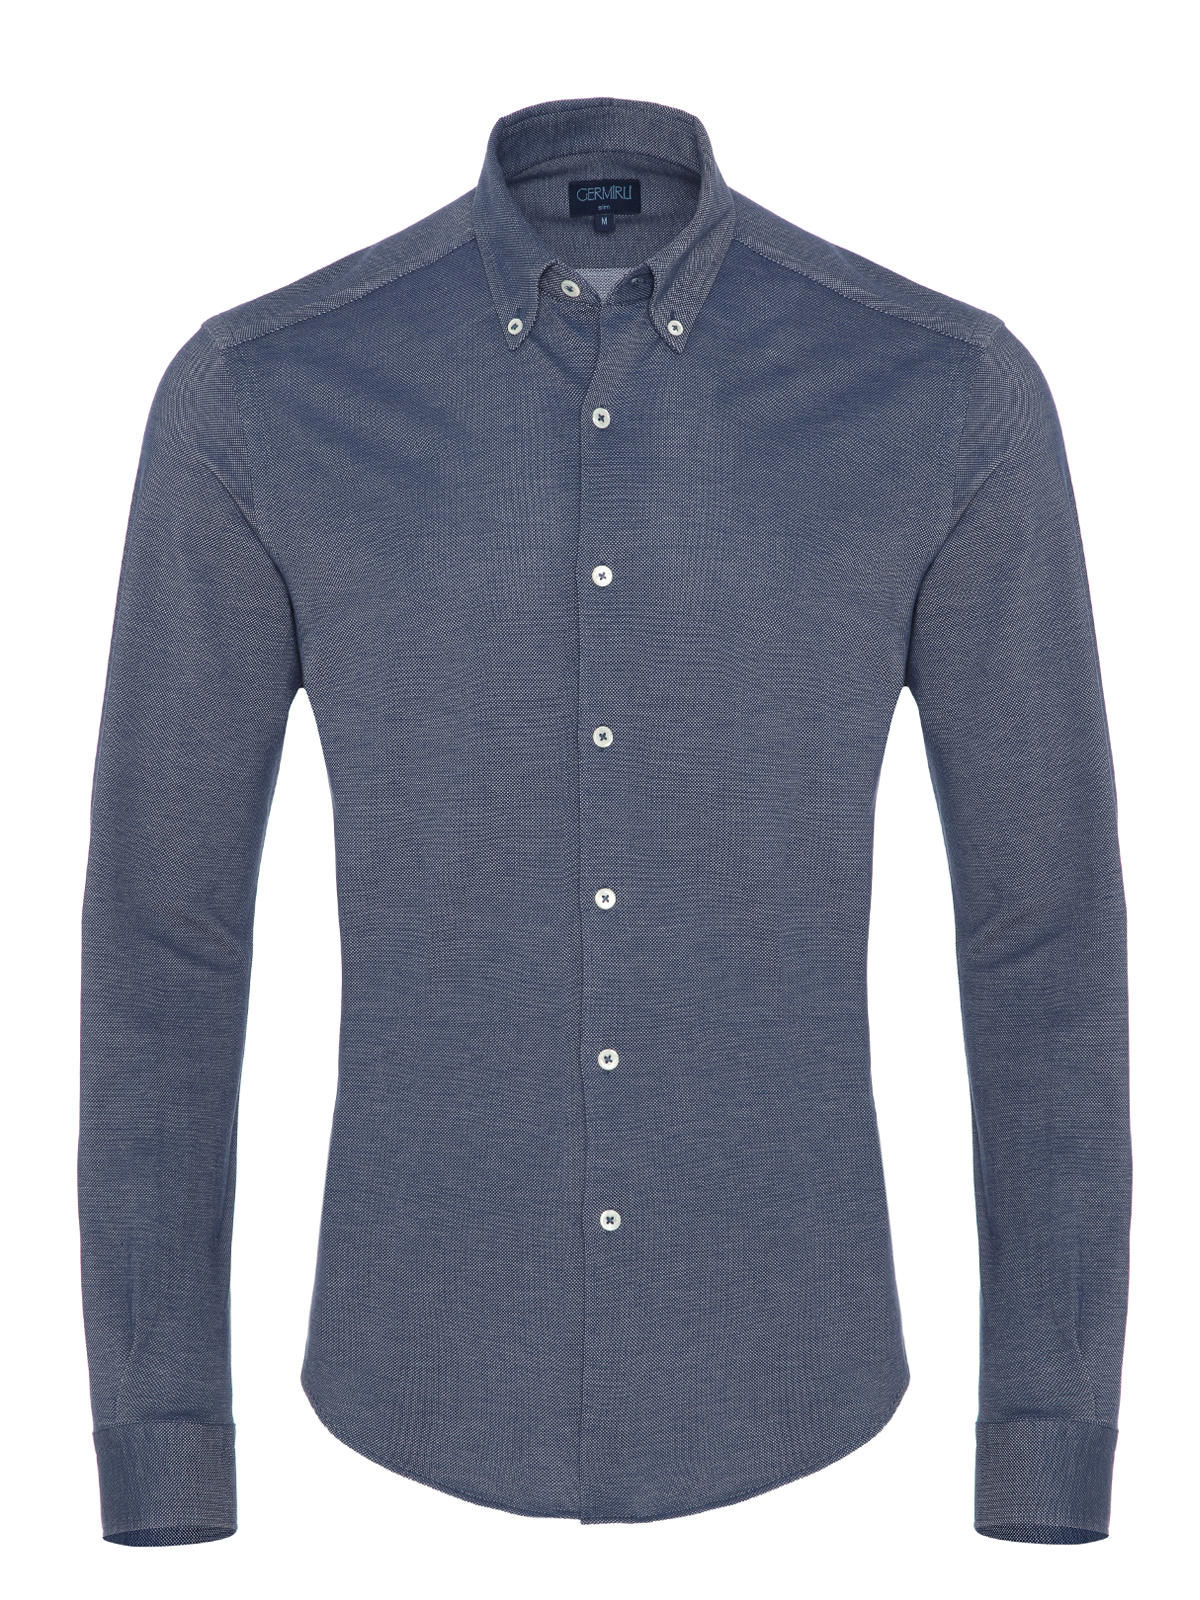 Germirli Navy Blue Button Down Collar Piquet Knitted Slim Fit Shirt